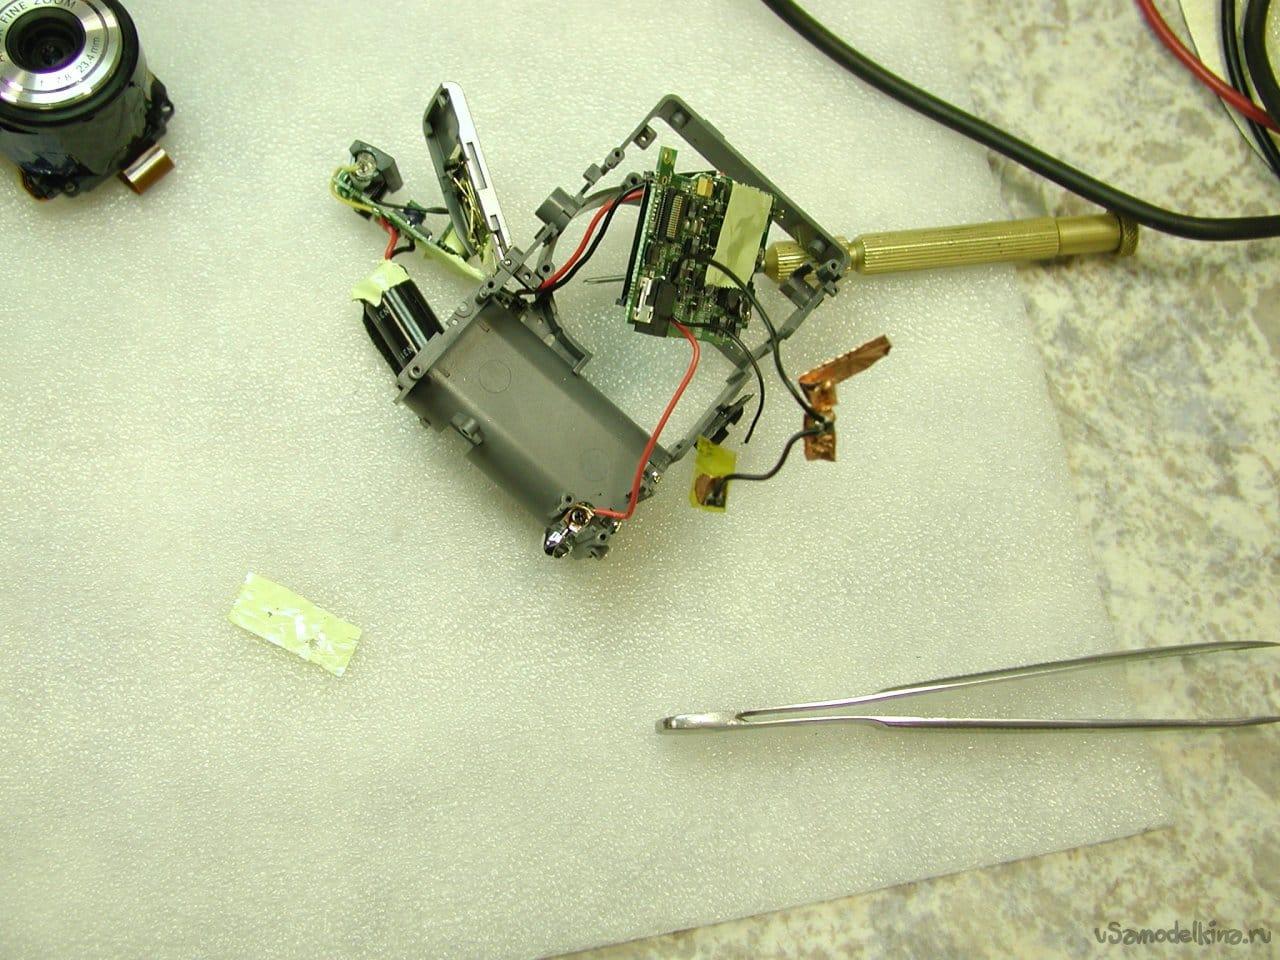 How the camera dug sand. Genius P-433